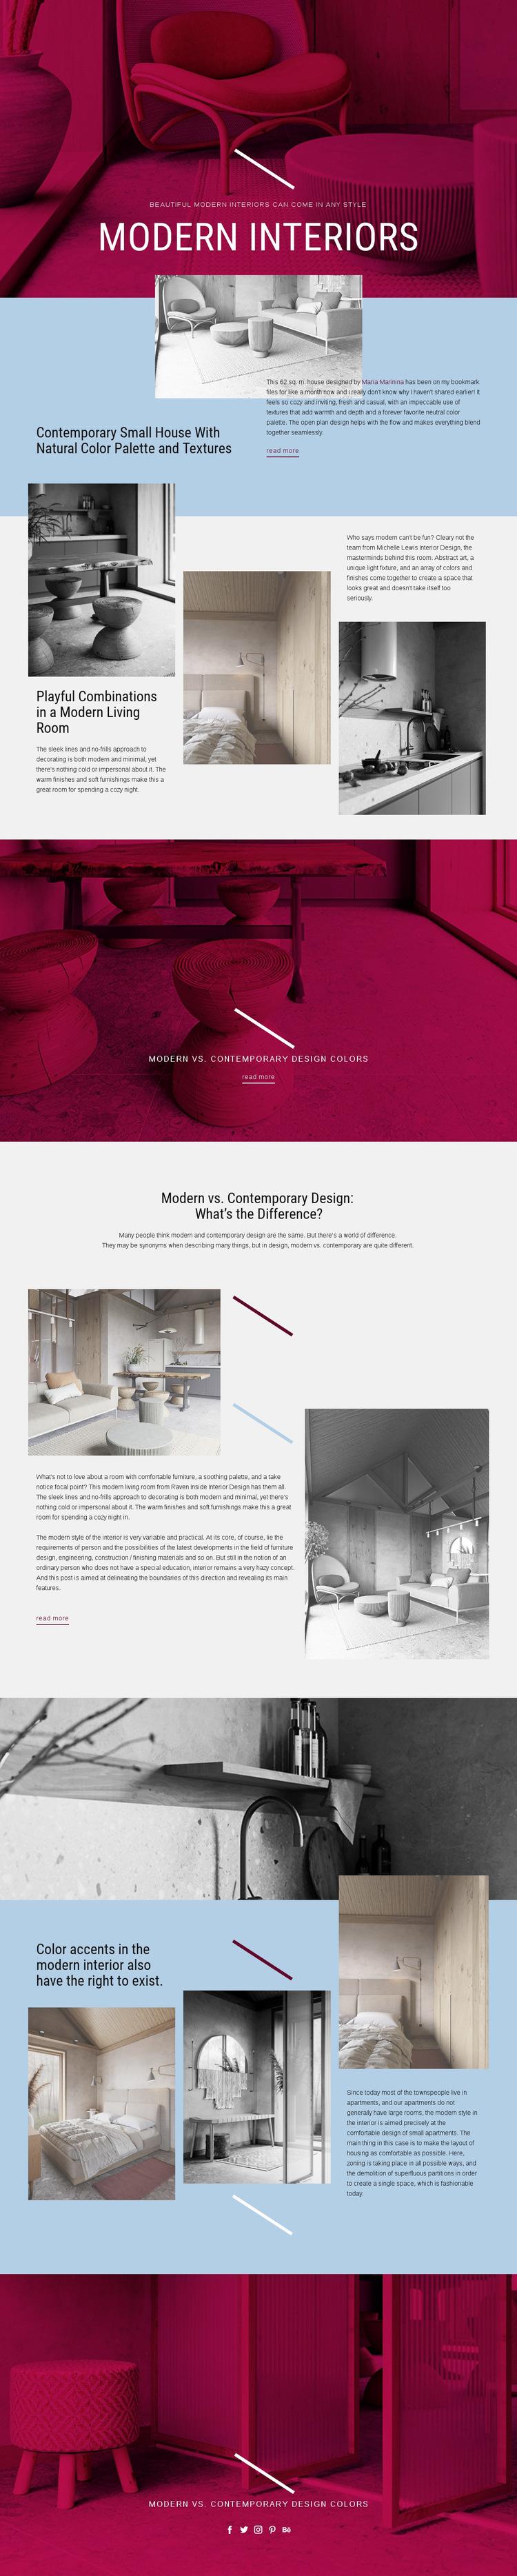 Modern Interiors Web Page Design